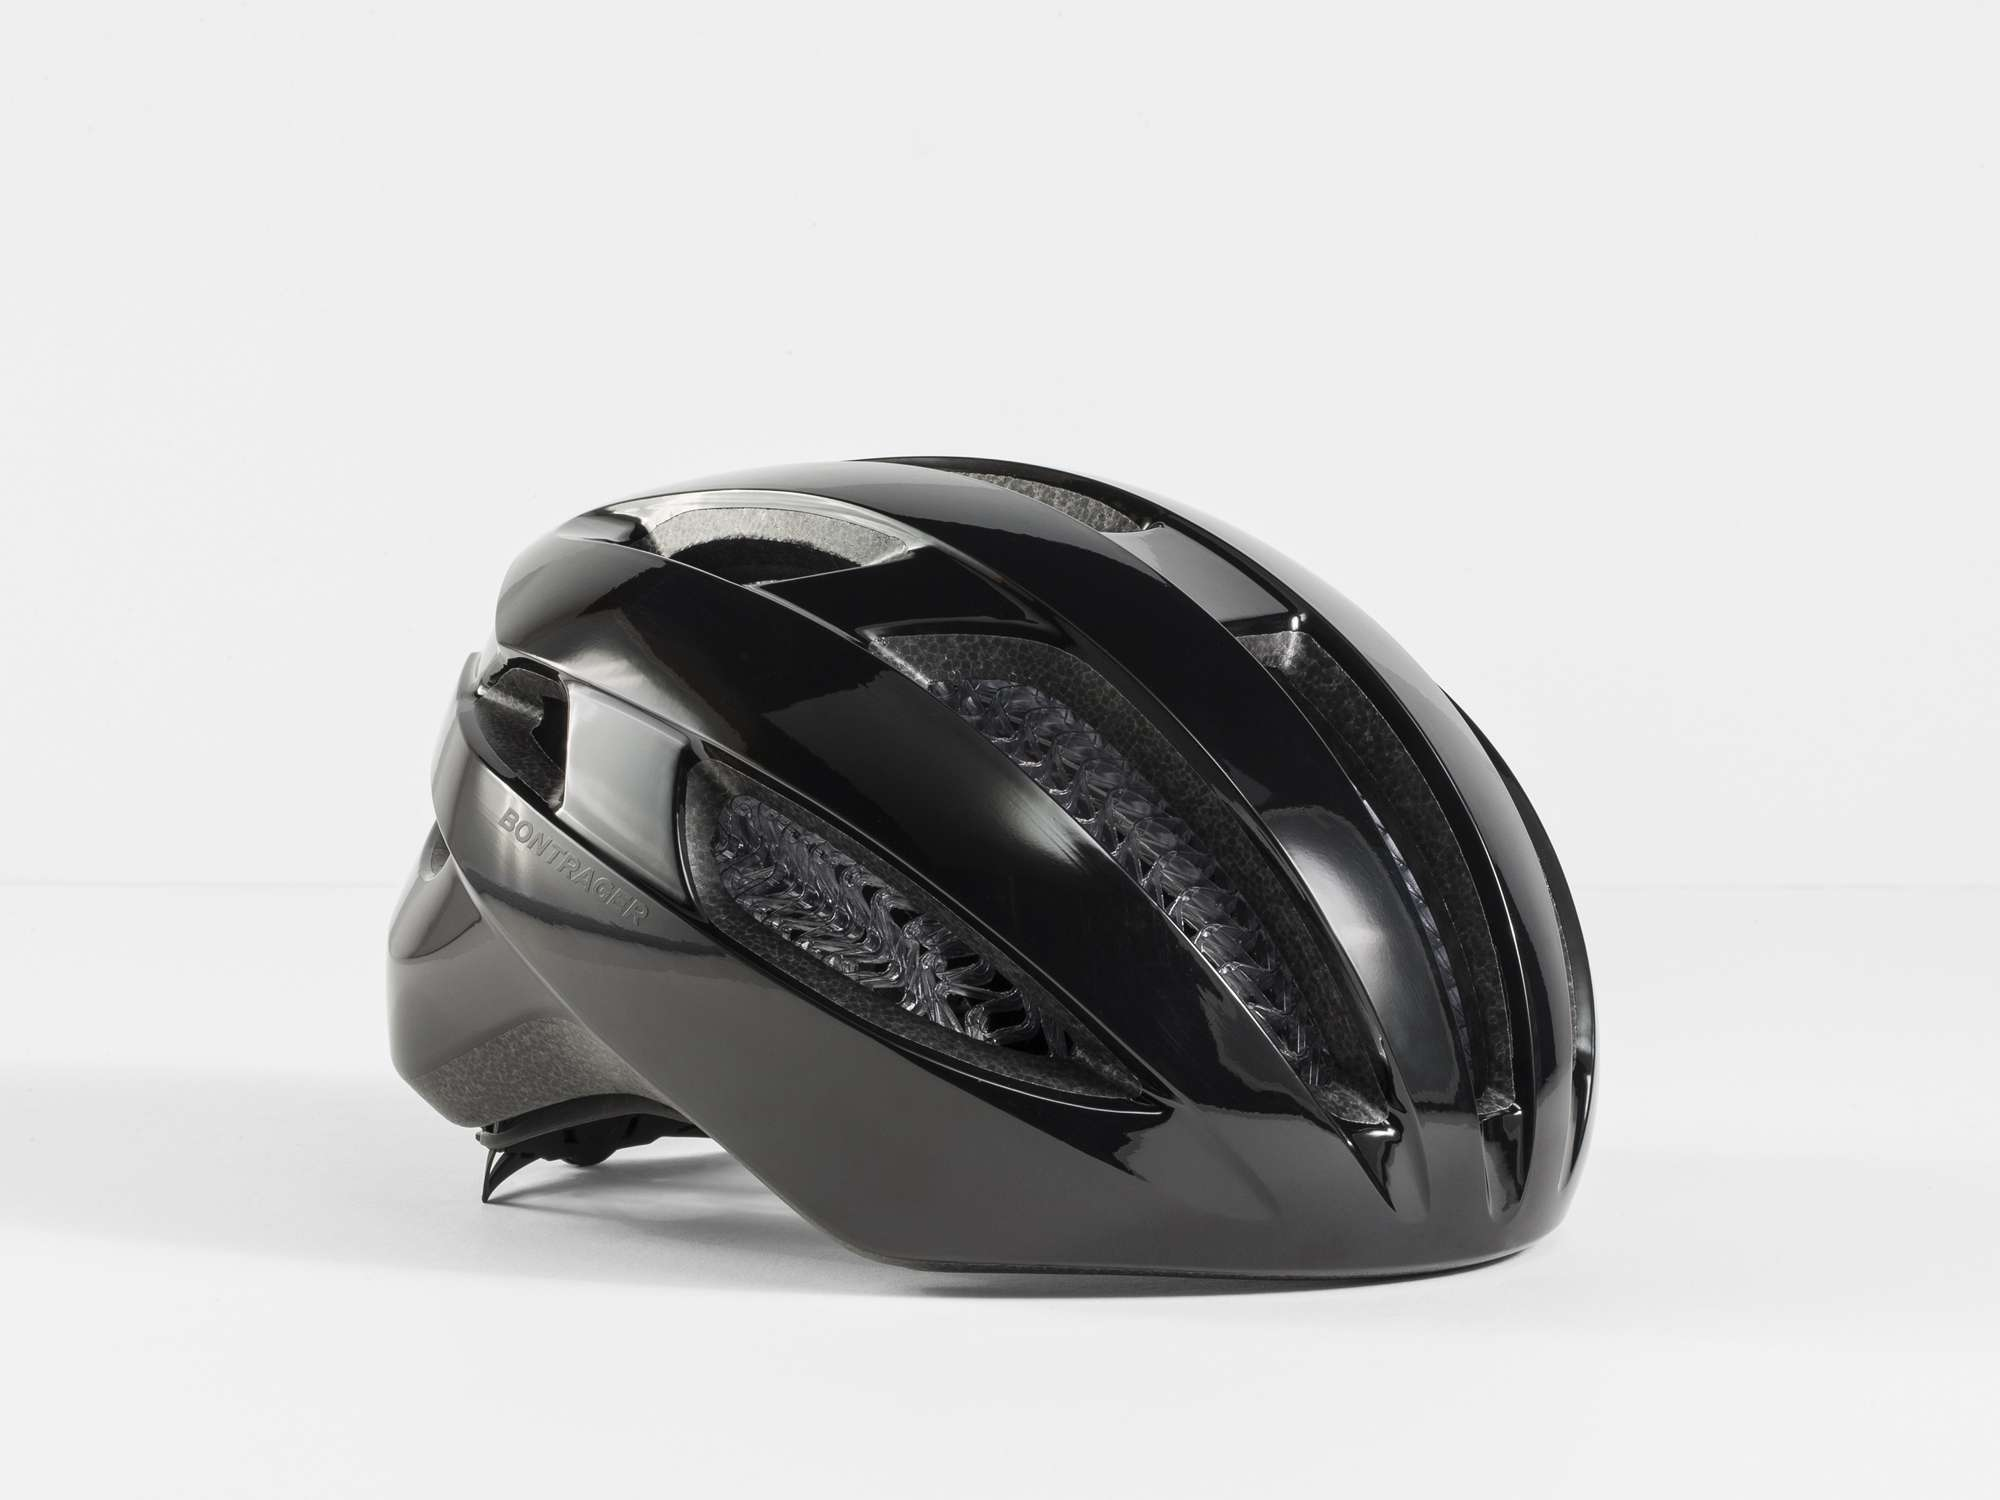 Helmet Bontrager Starvos WaveCel Medium Black CE